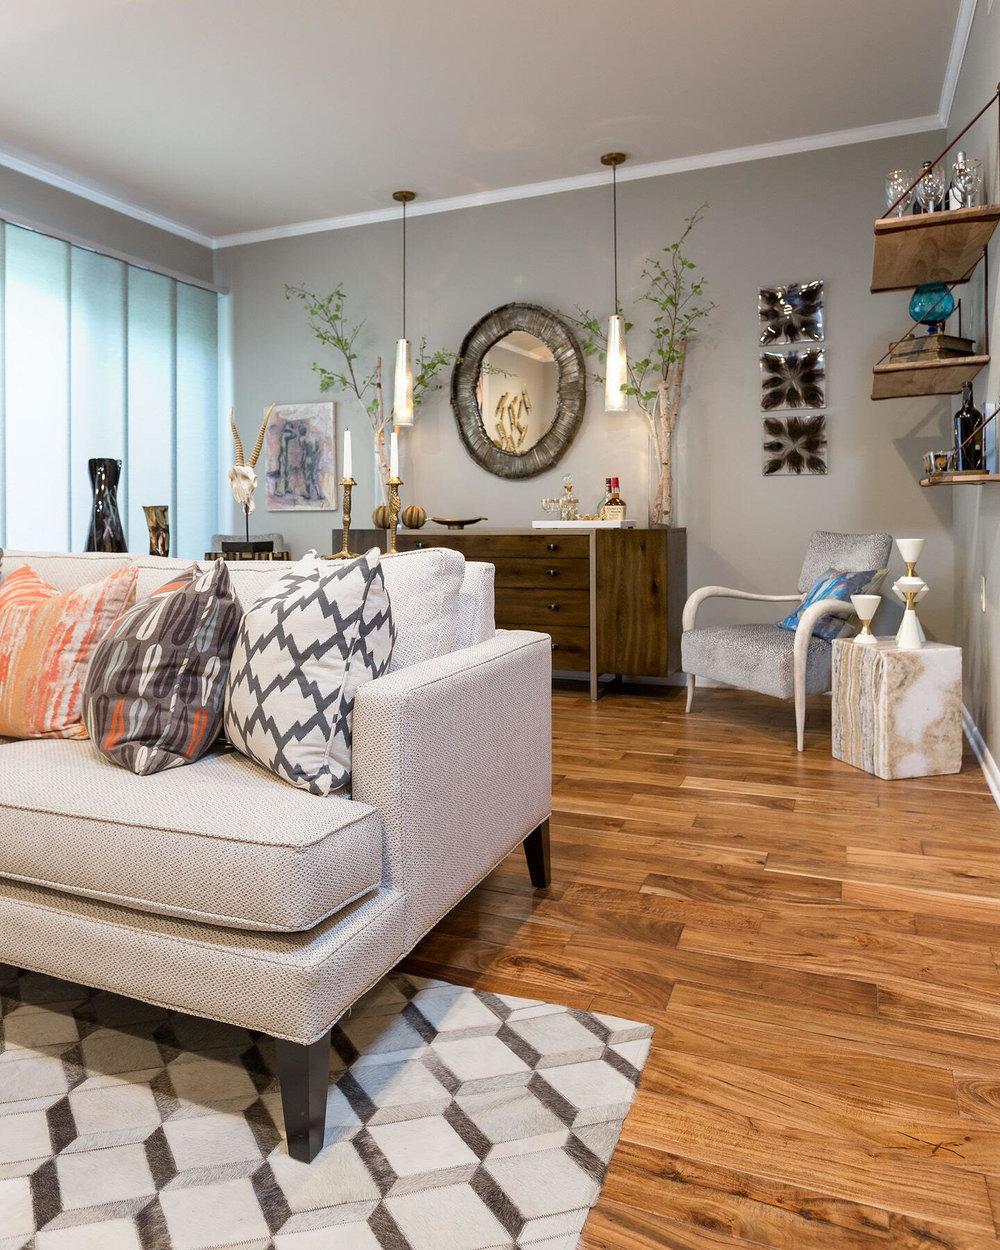 DESIGNER SPOTLIGHT - Cheryl Kees Clendenon, #livingroom #modernlivingroom #hiderug #roundmirror #moderncoastal